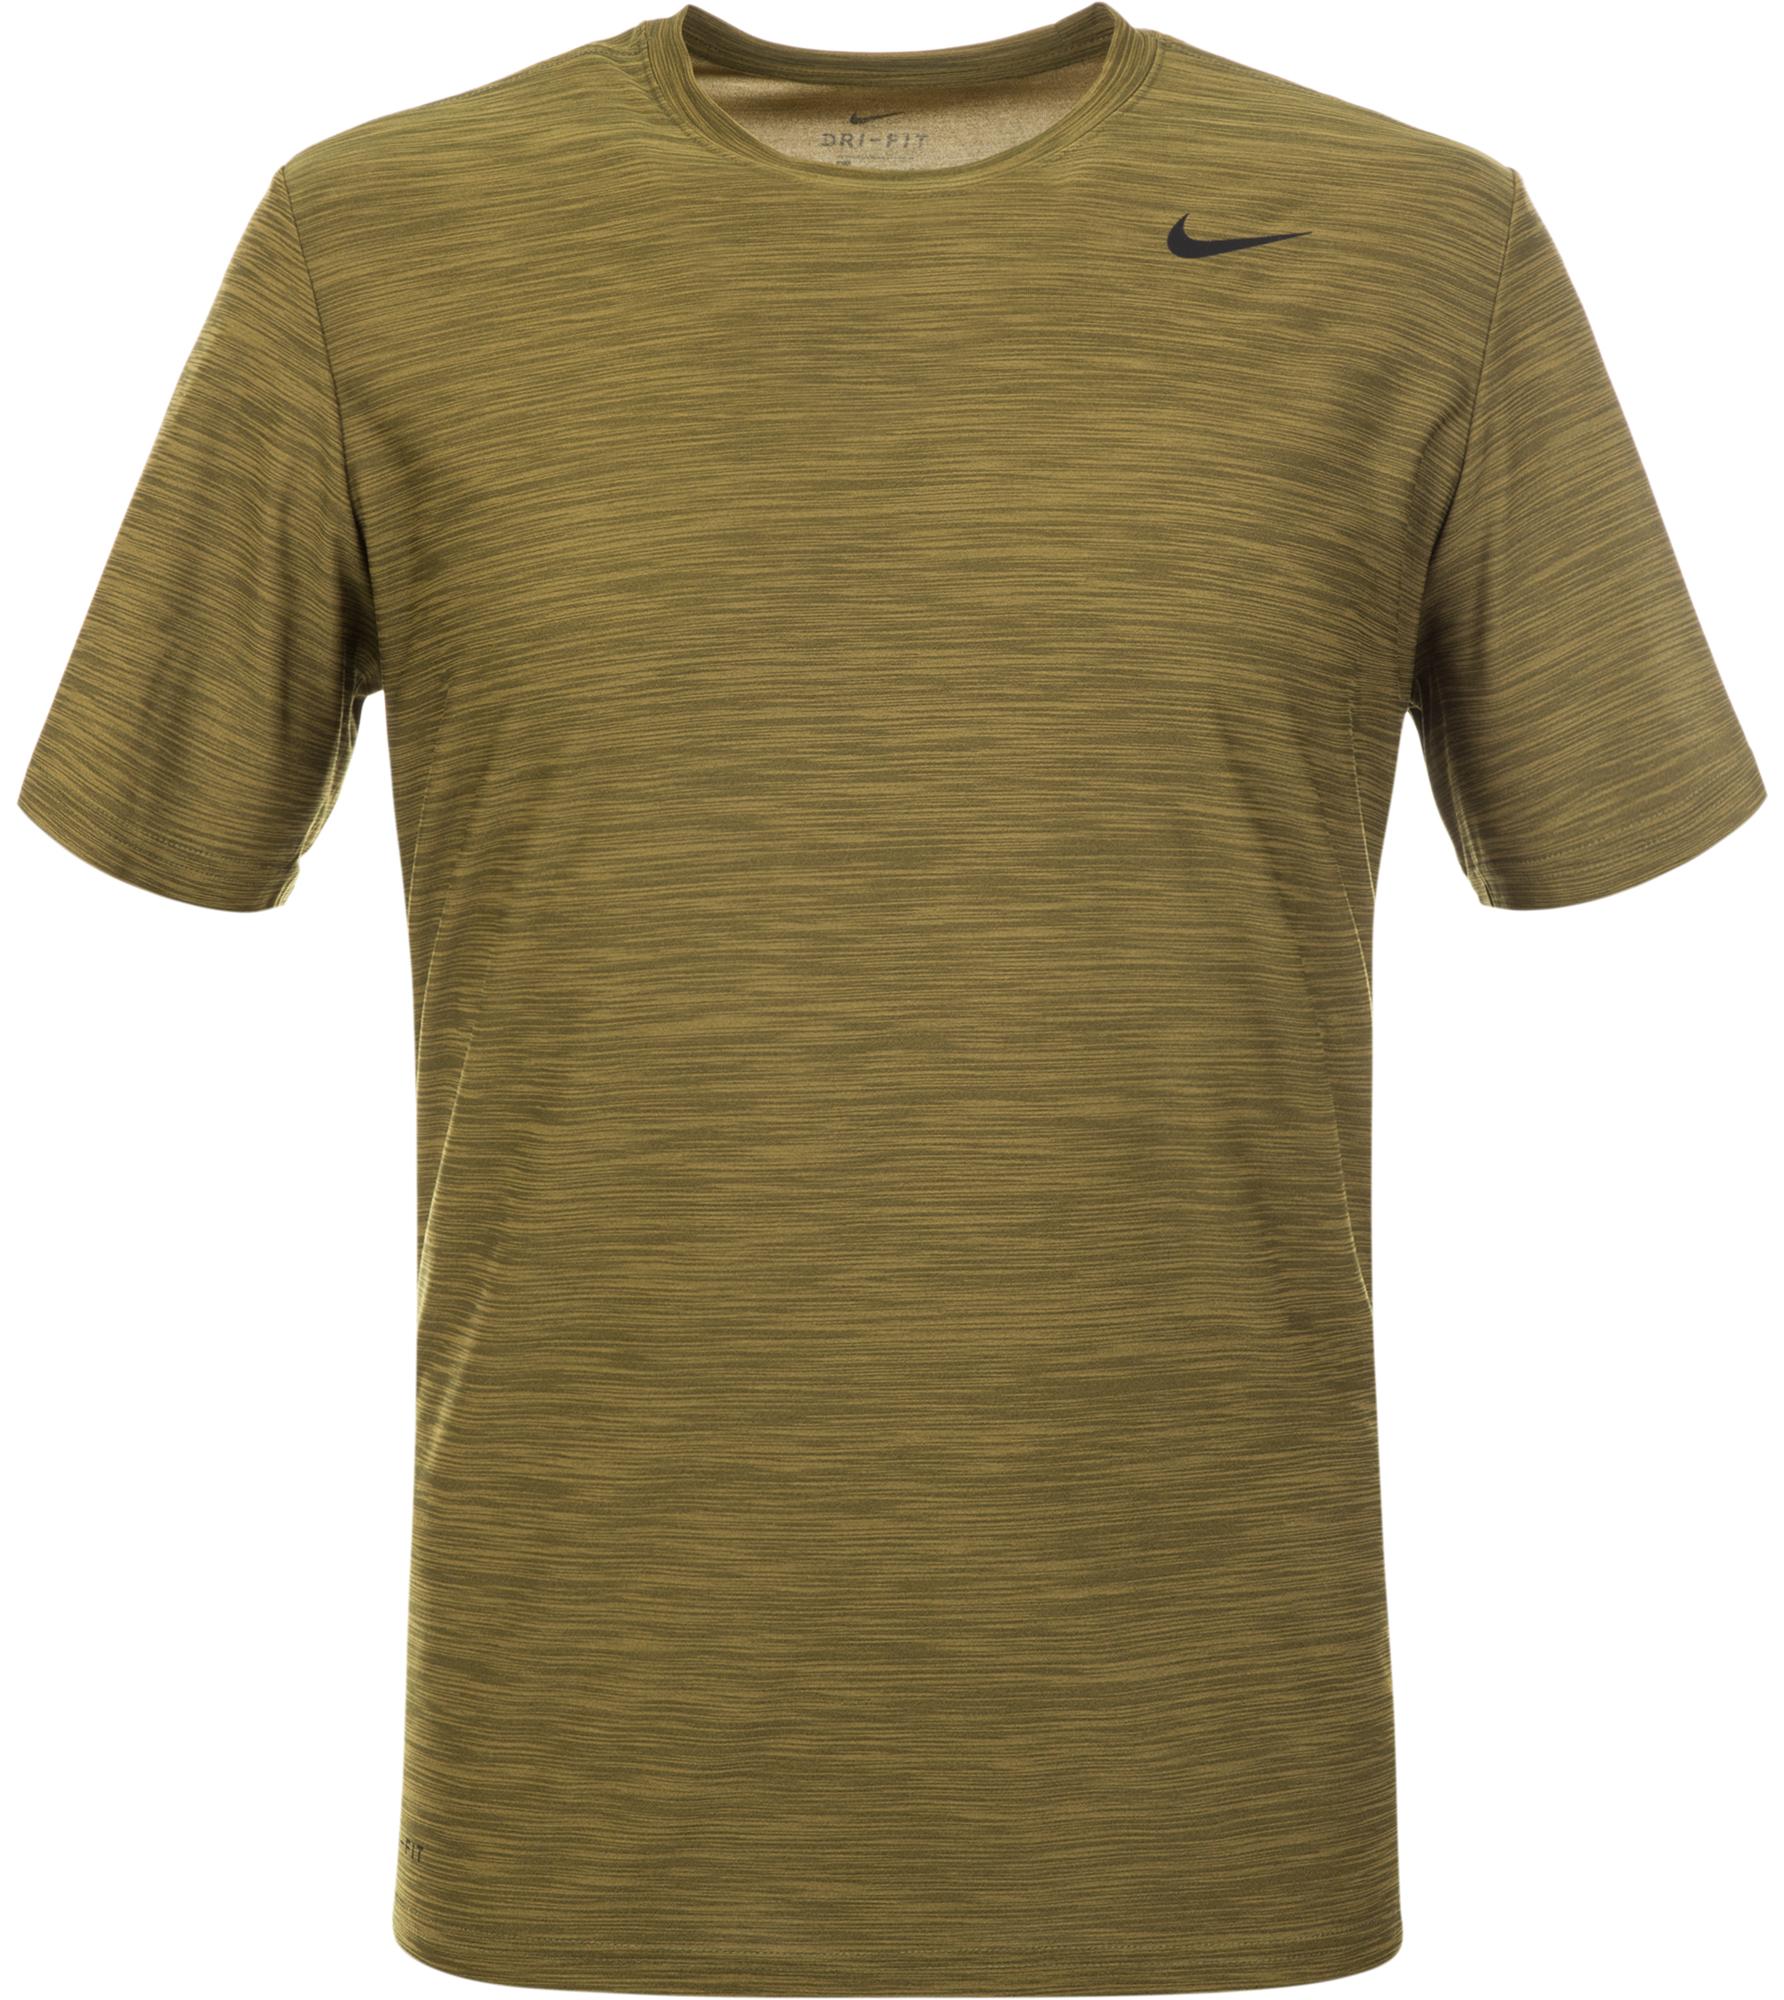 0f21ca6d46f3 Nike Футболка мужская Nike Dry, размер 52-54